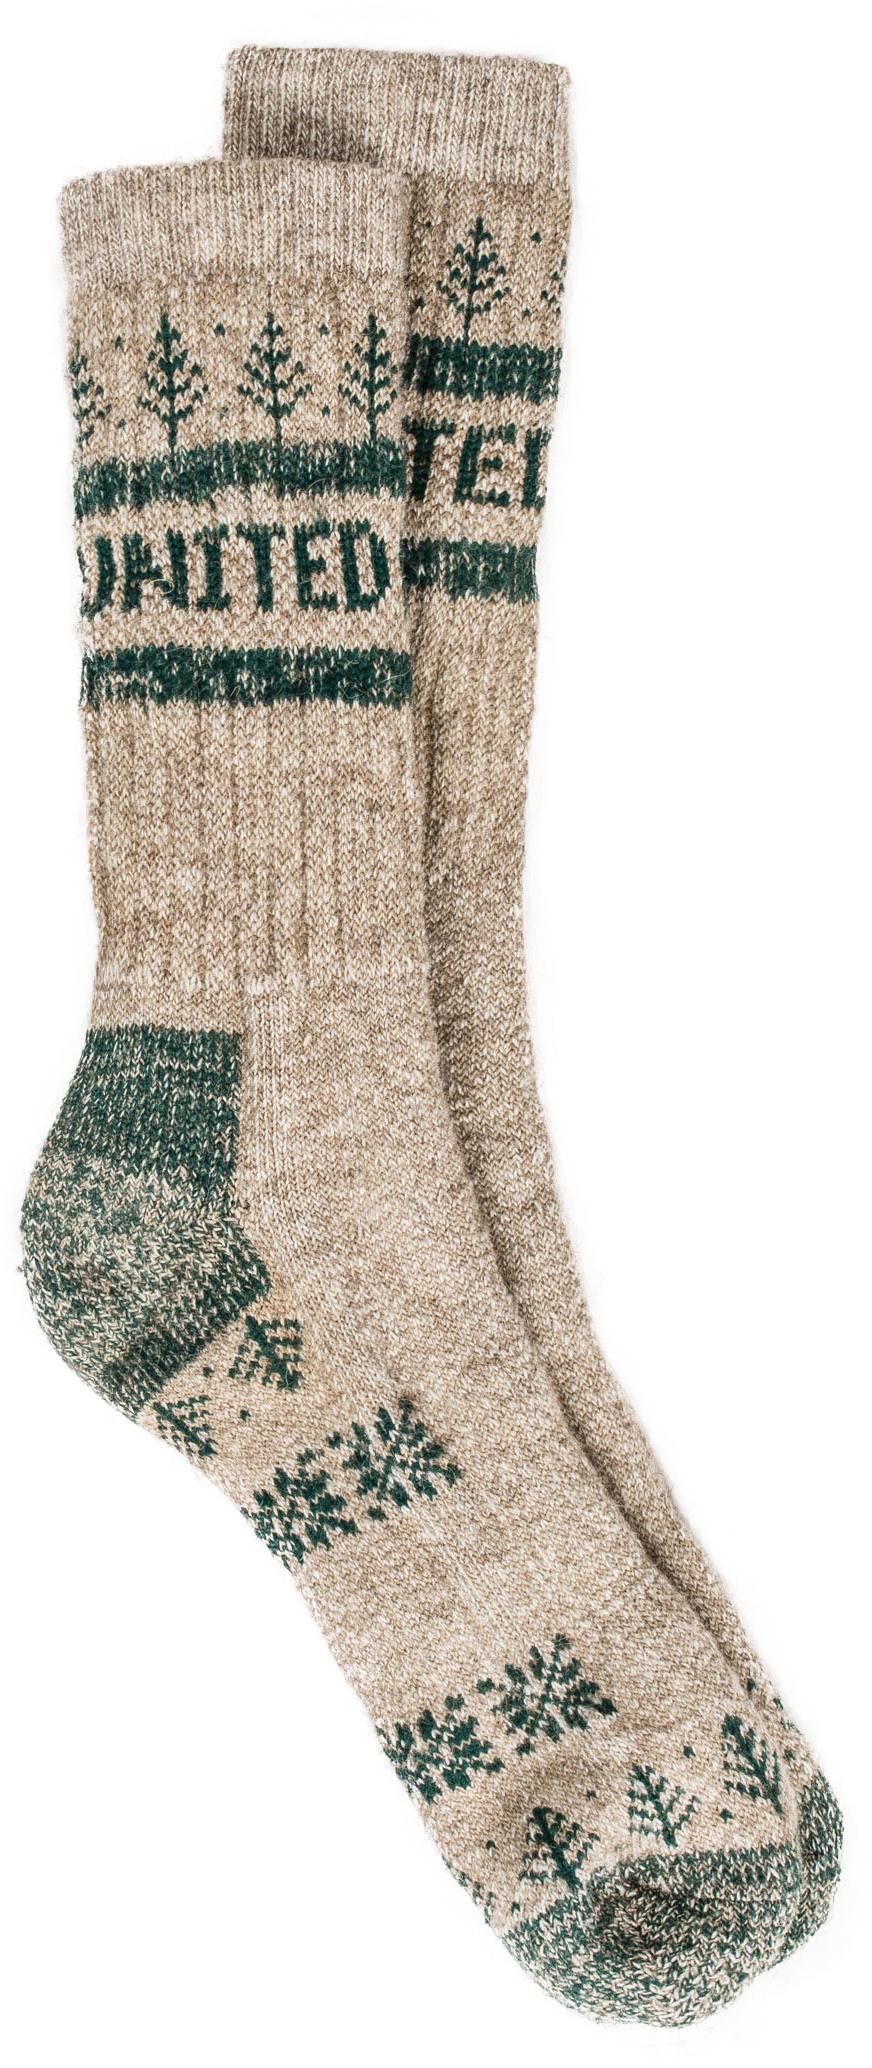 bddca17542 Men's Socks | MEC